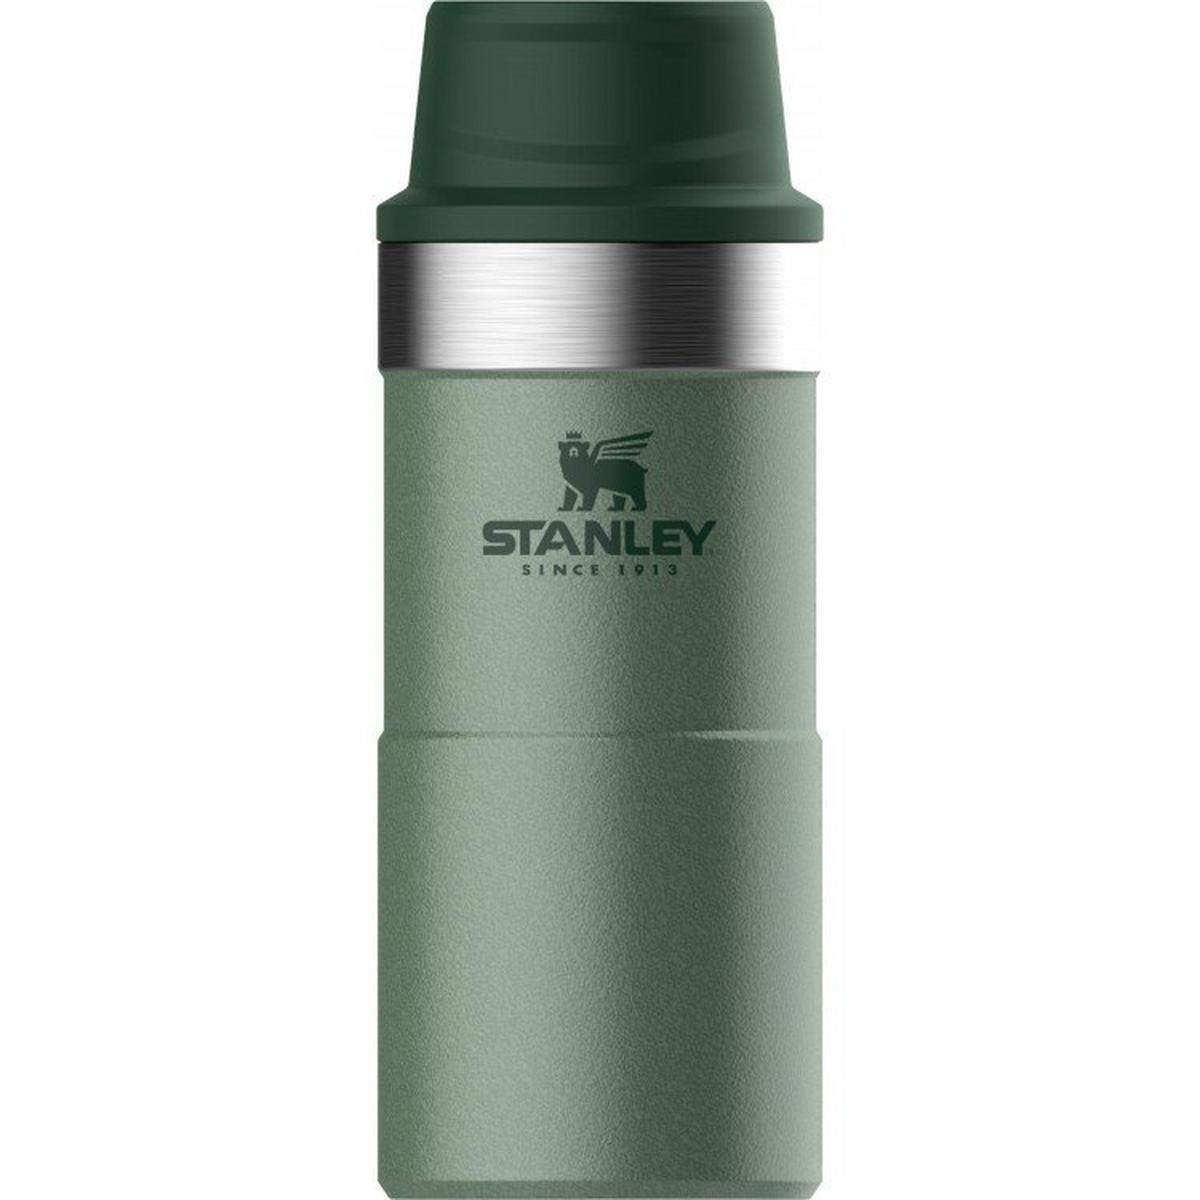 Stanley Travel Mug 0.35l - Green